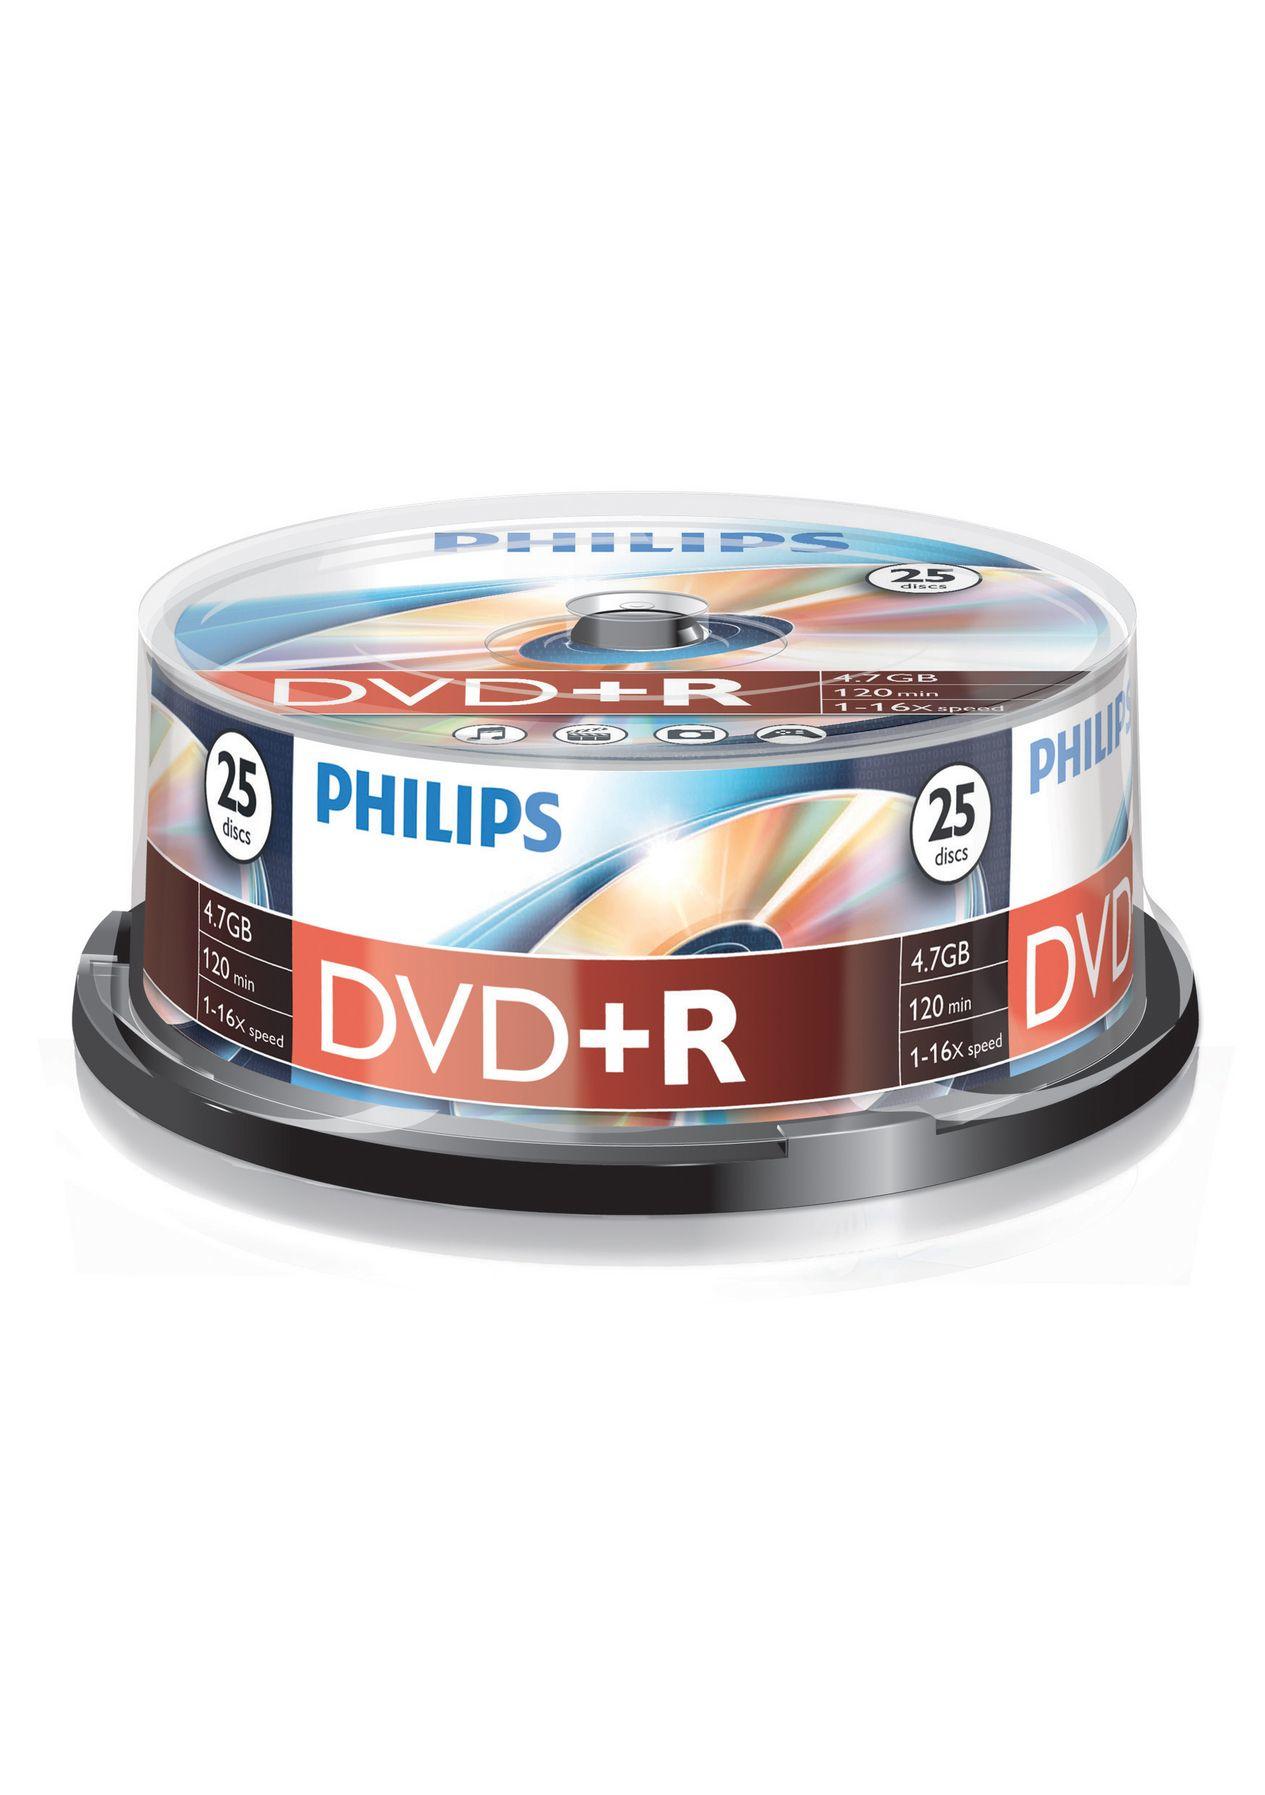 Emtec - Dr4s6b25f/00 PHILIPS DVD+R